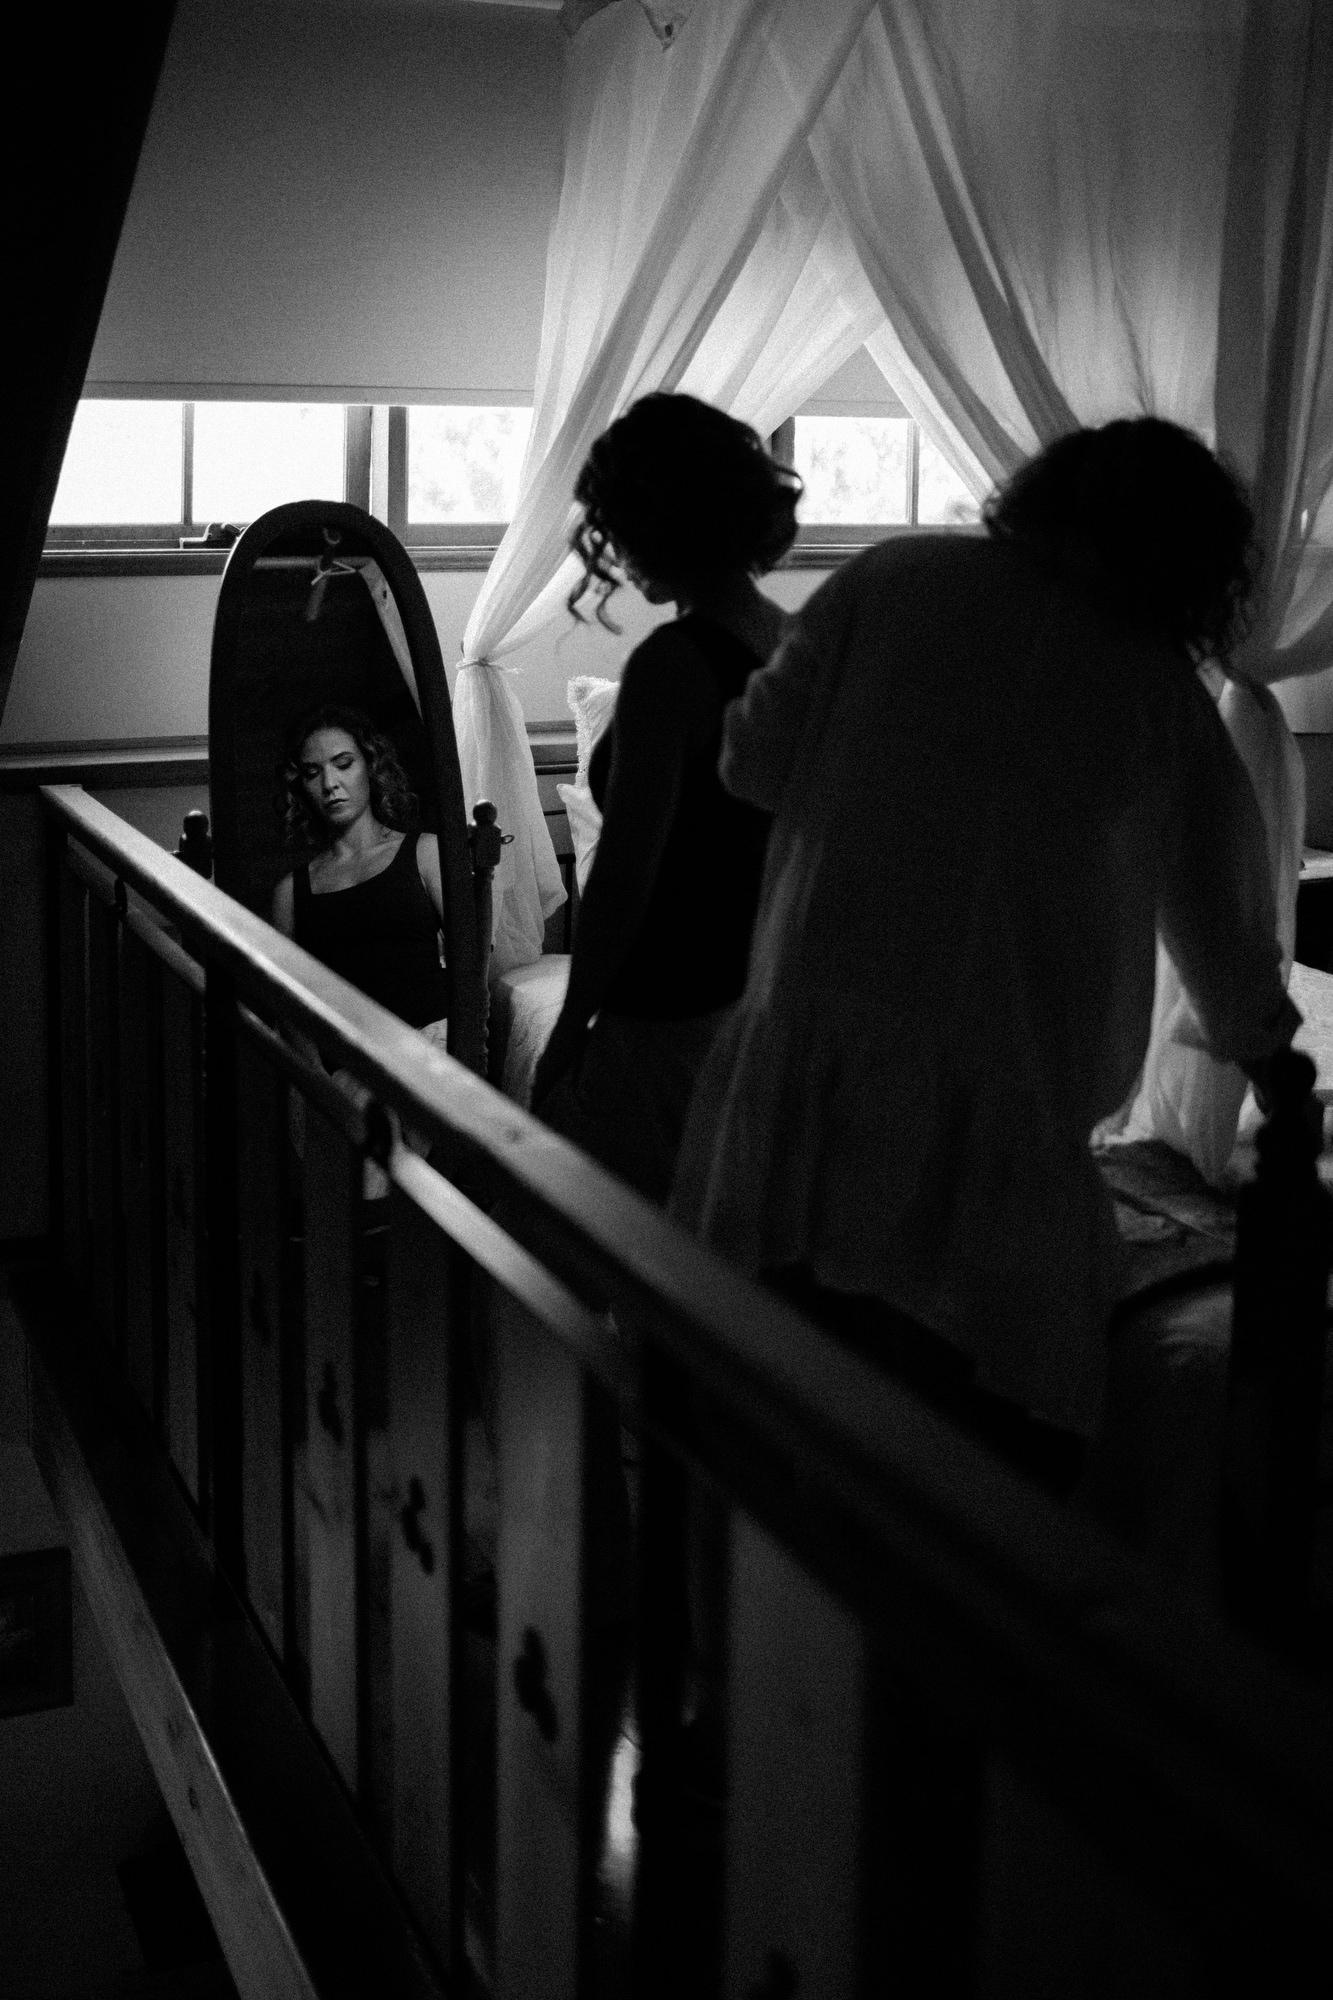 Petrou & Dwyer - CARTER & ROSE PHOTOGRAPHY-26.JPG